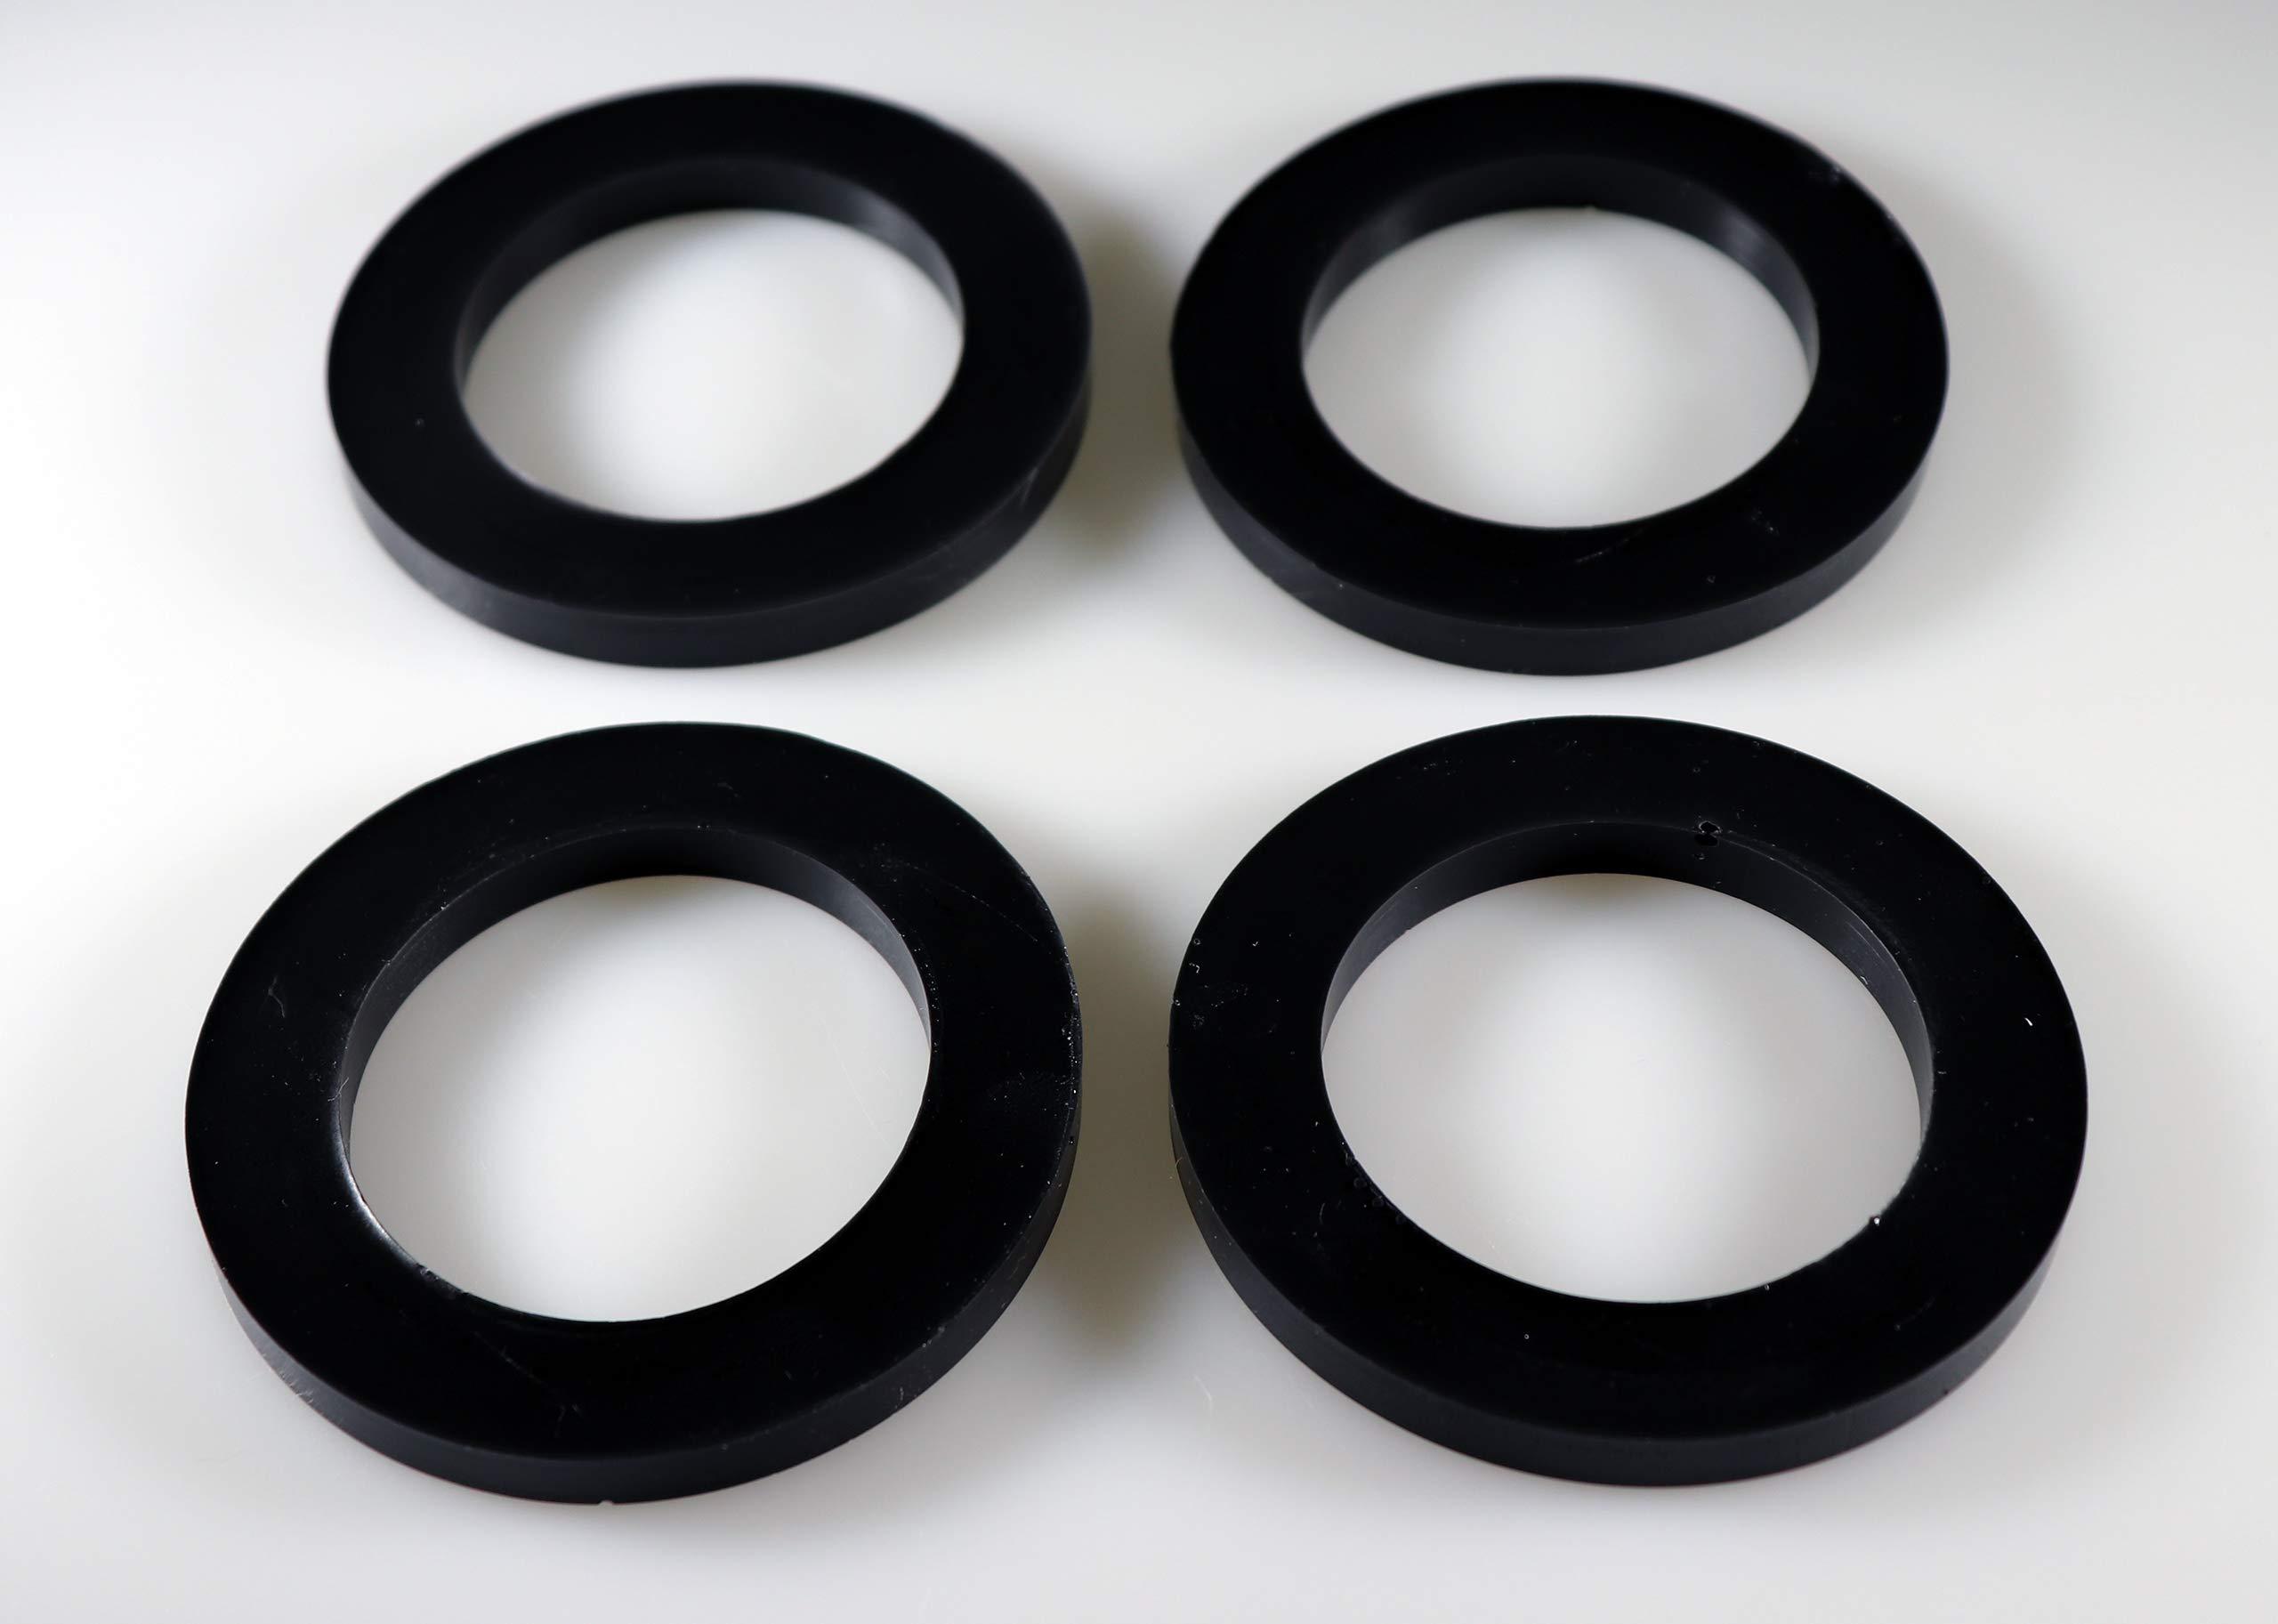 Sorbothane Premium Vibration Isolation Washer (3'' OD x 2'' ID x 0.25'', 30 Durometer (Soft))